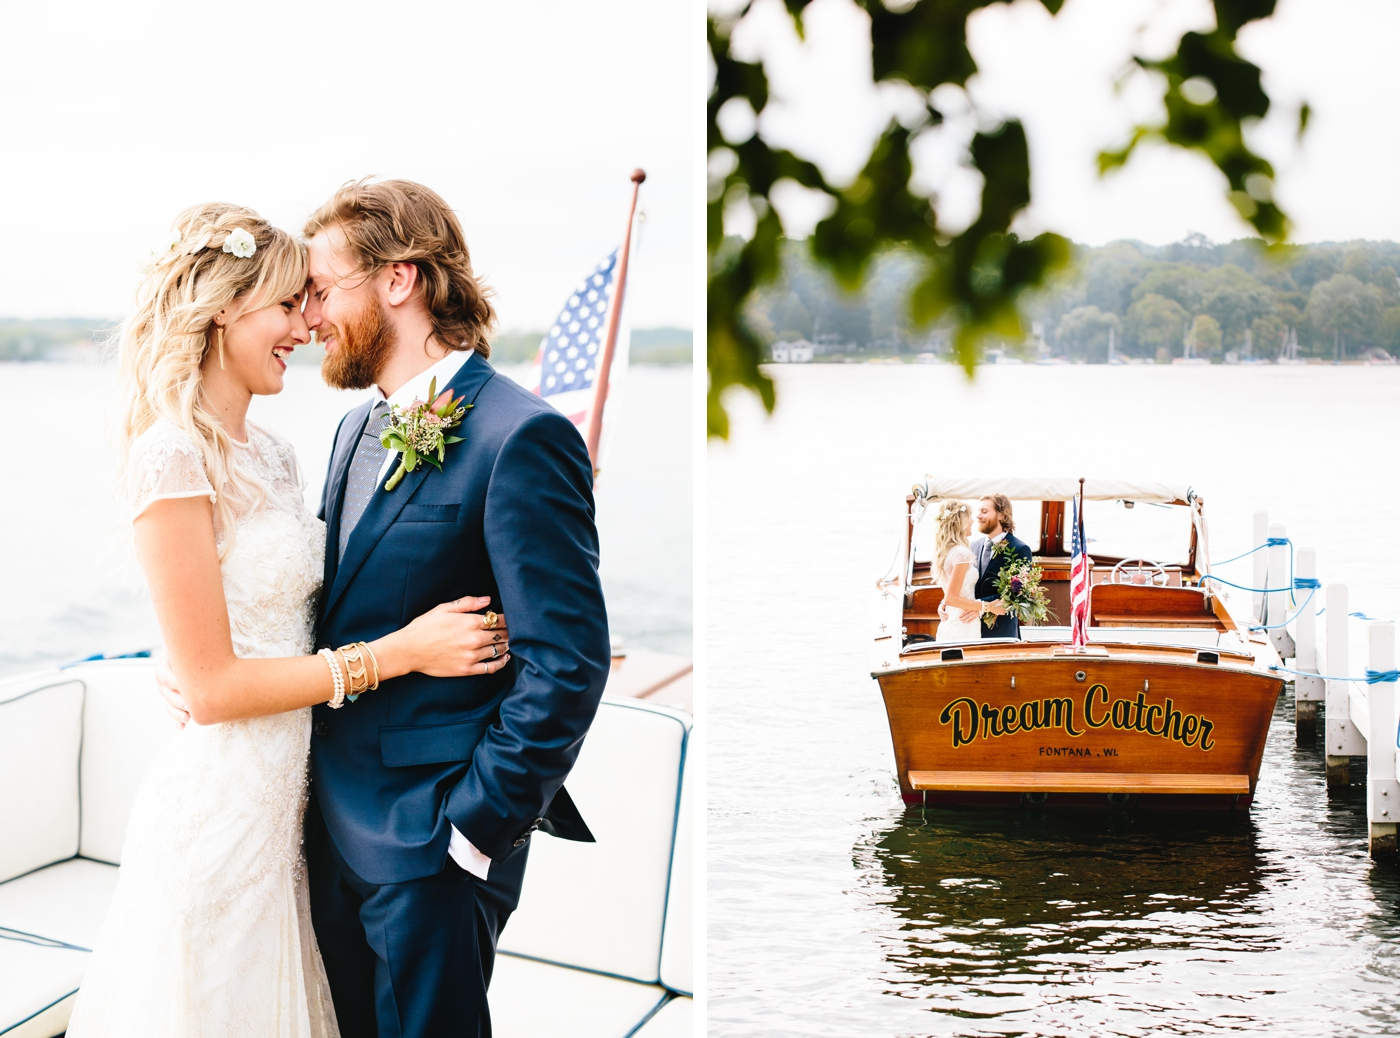 chicago-fine-art-wedding-photography-chriskelsey21